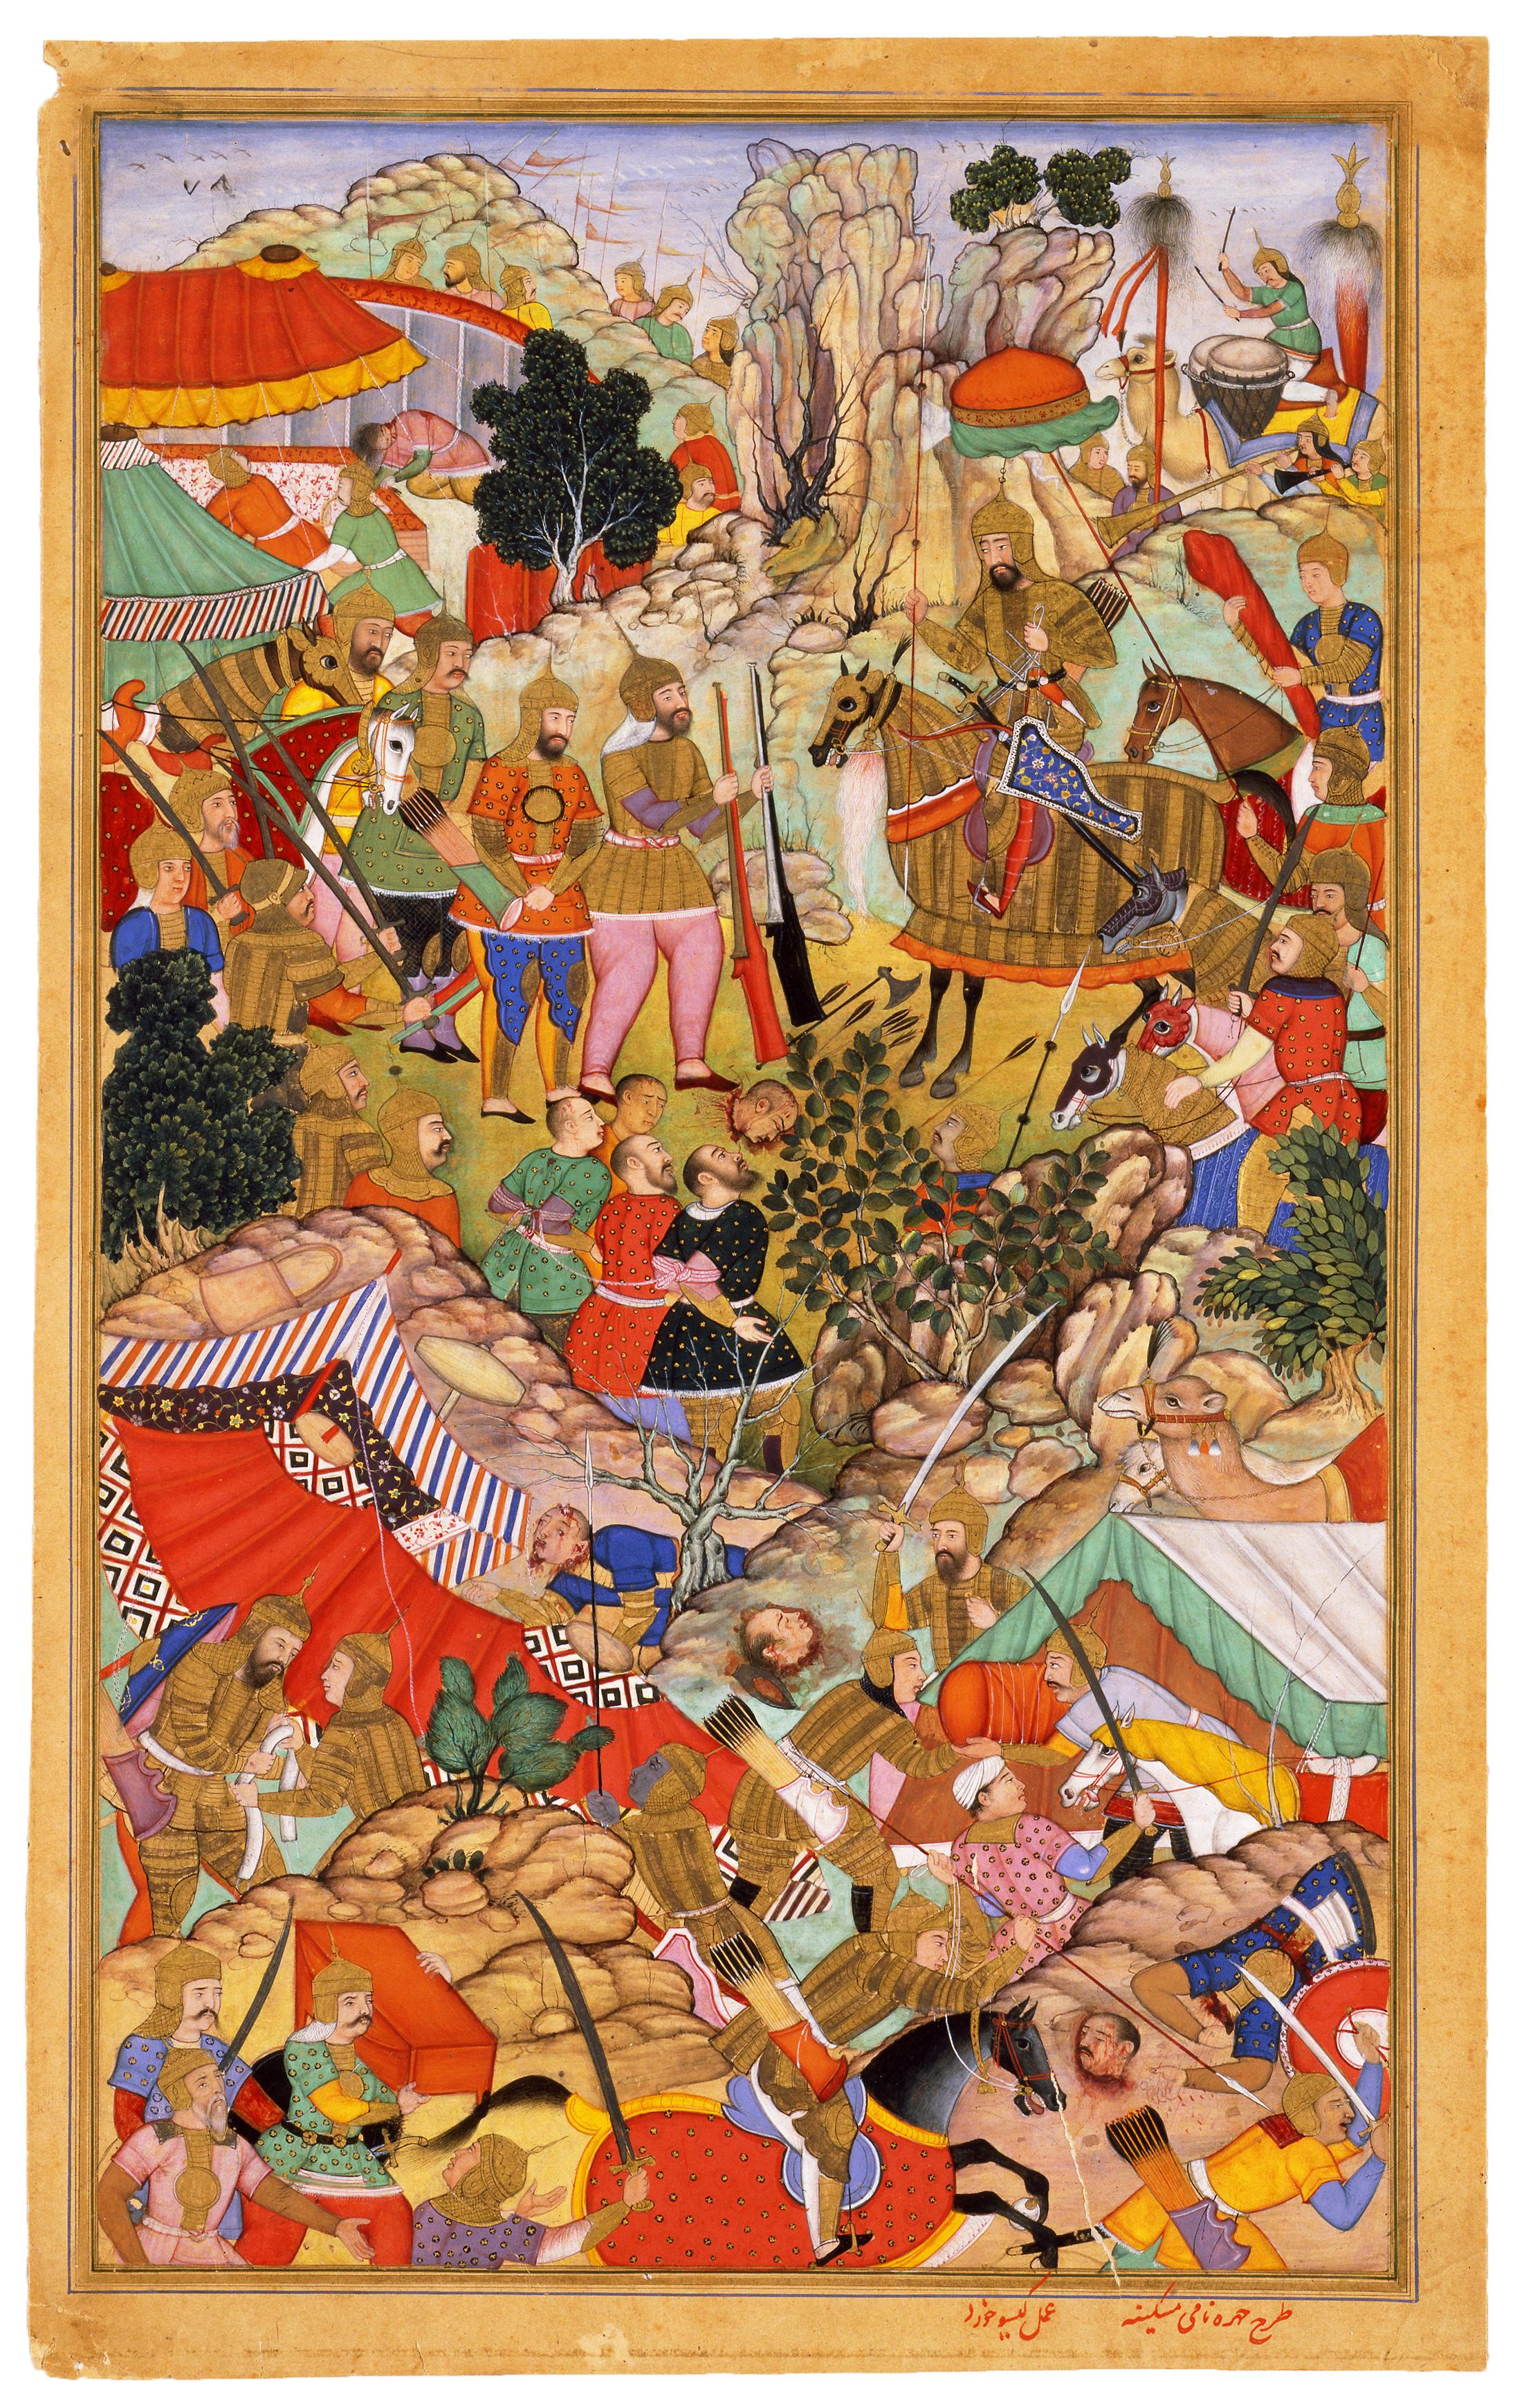 File:Miskin. Miniature from Rashid al'Din Jami-al-Tavarikh.